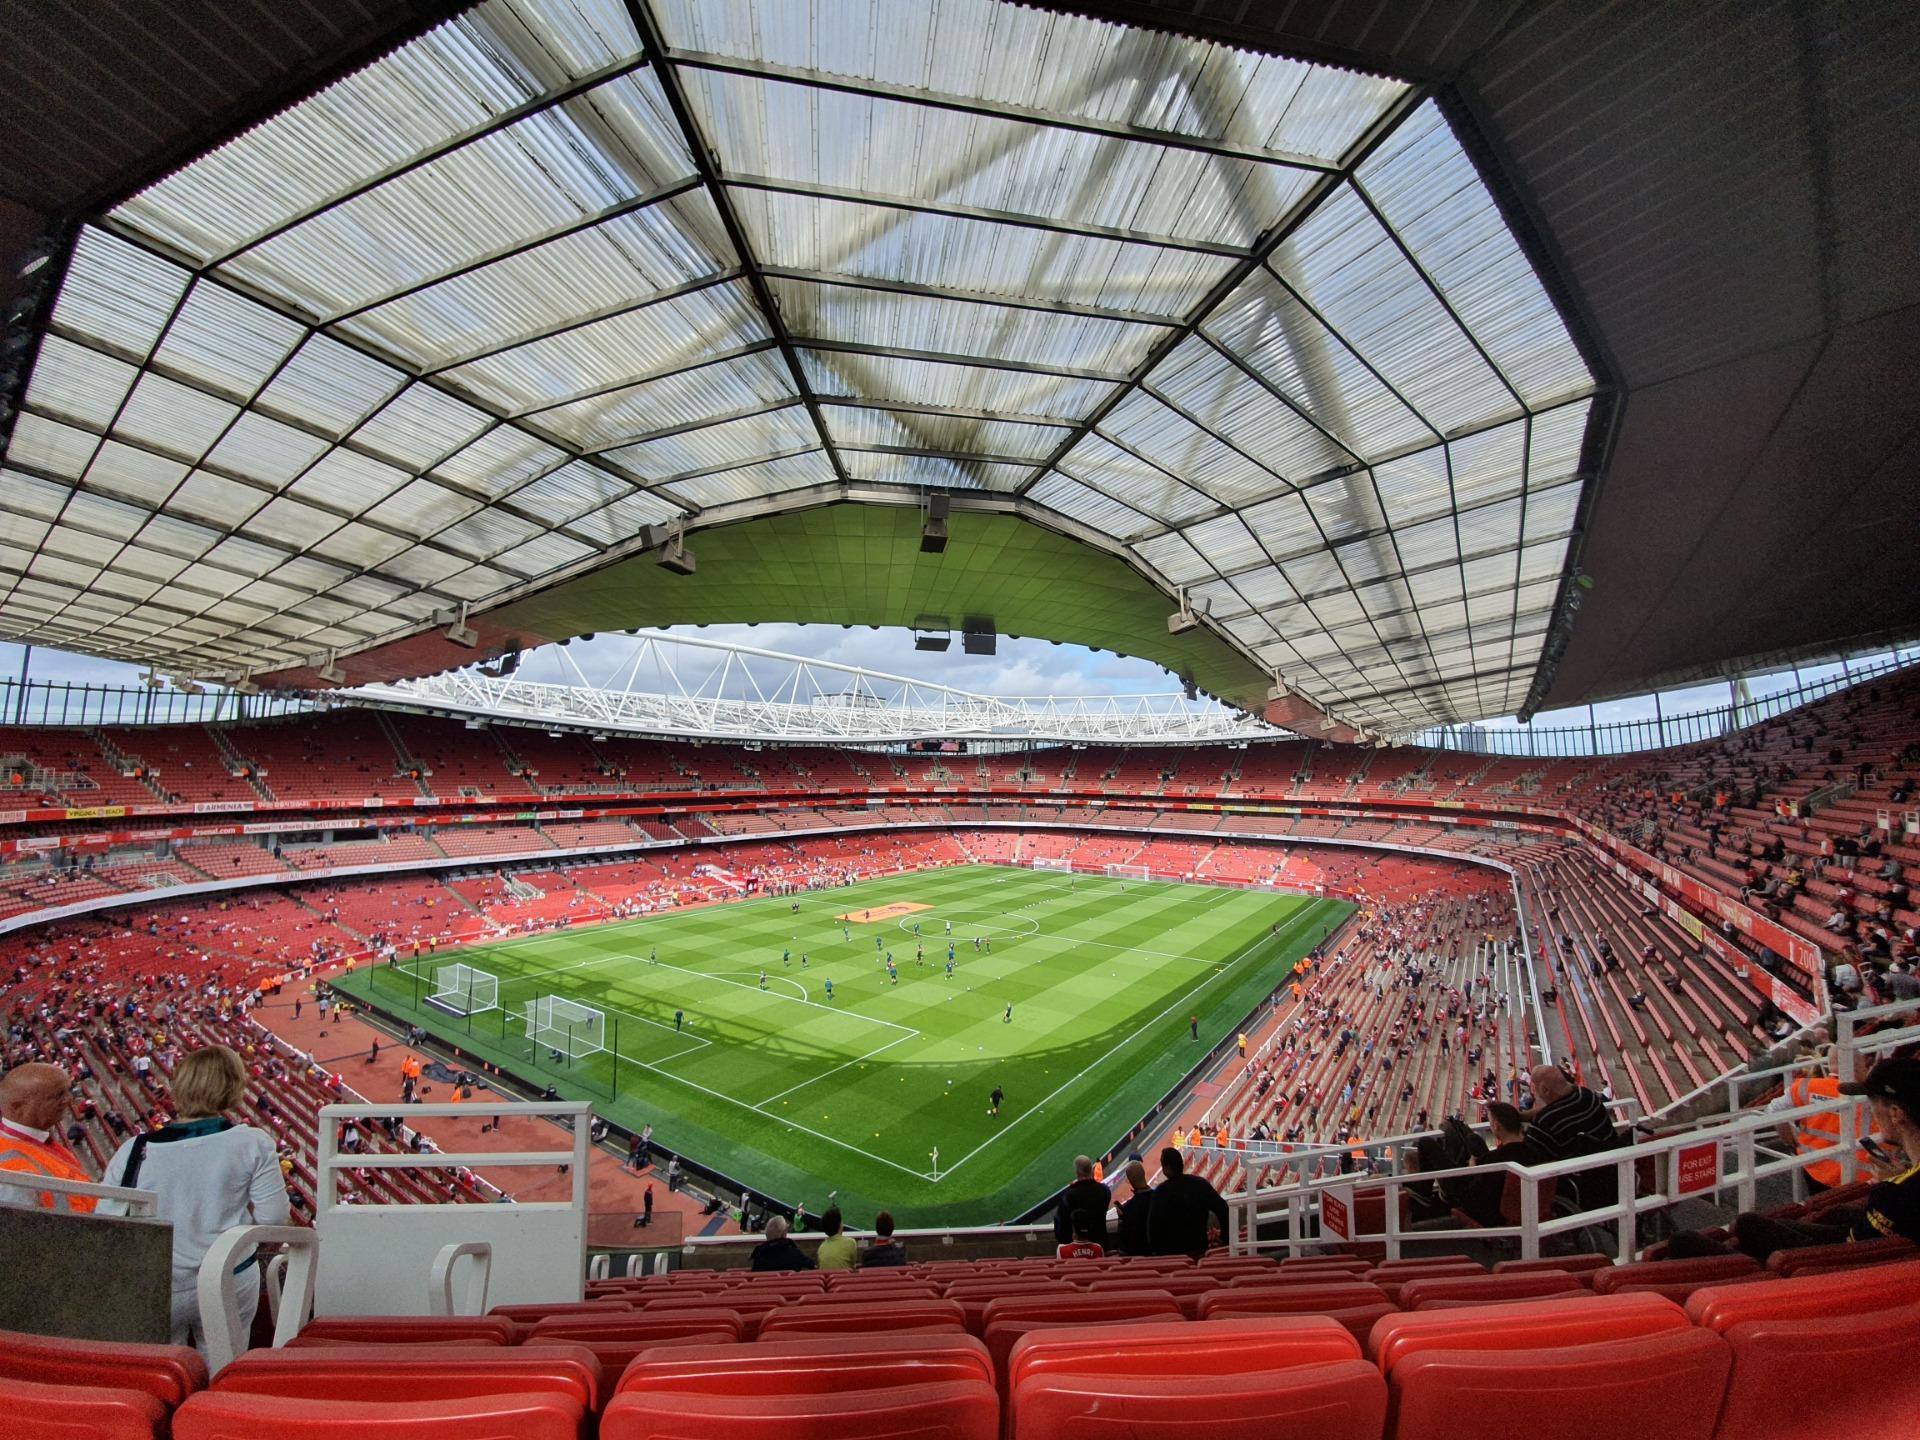 Emirates Stadium Section 119 Row 12 Seat 782